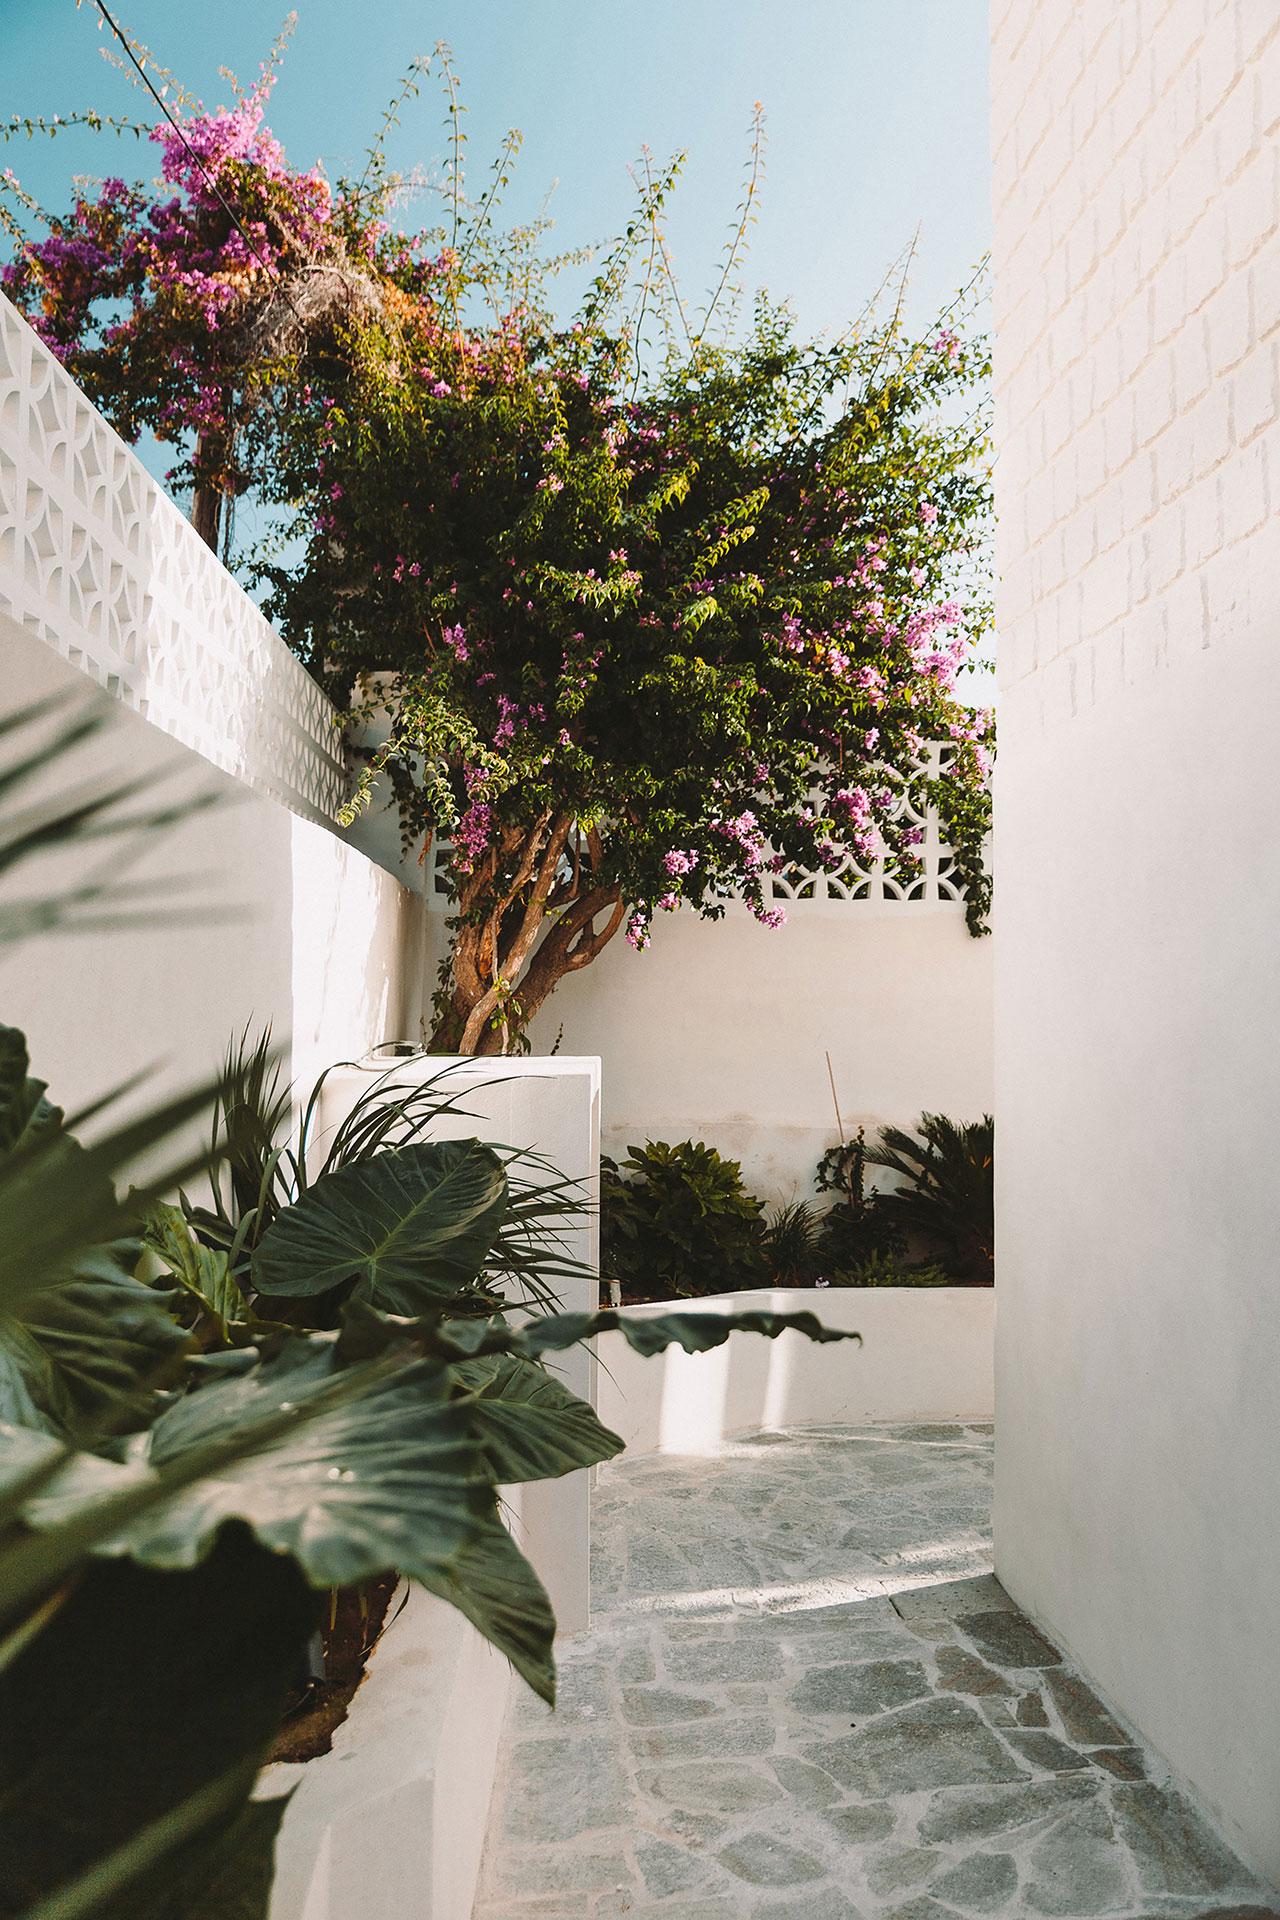 Casa Santa Teresa by Amelia Tavella. Photo by Thibaut Dini.